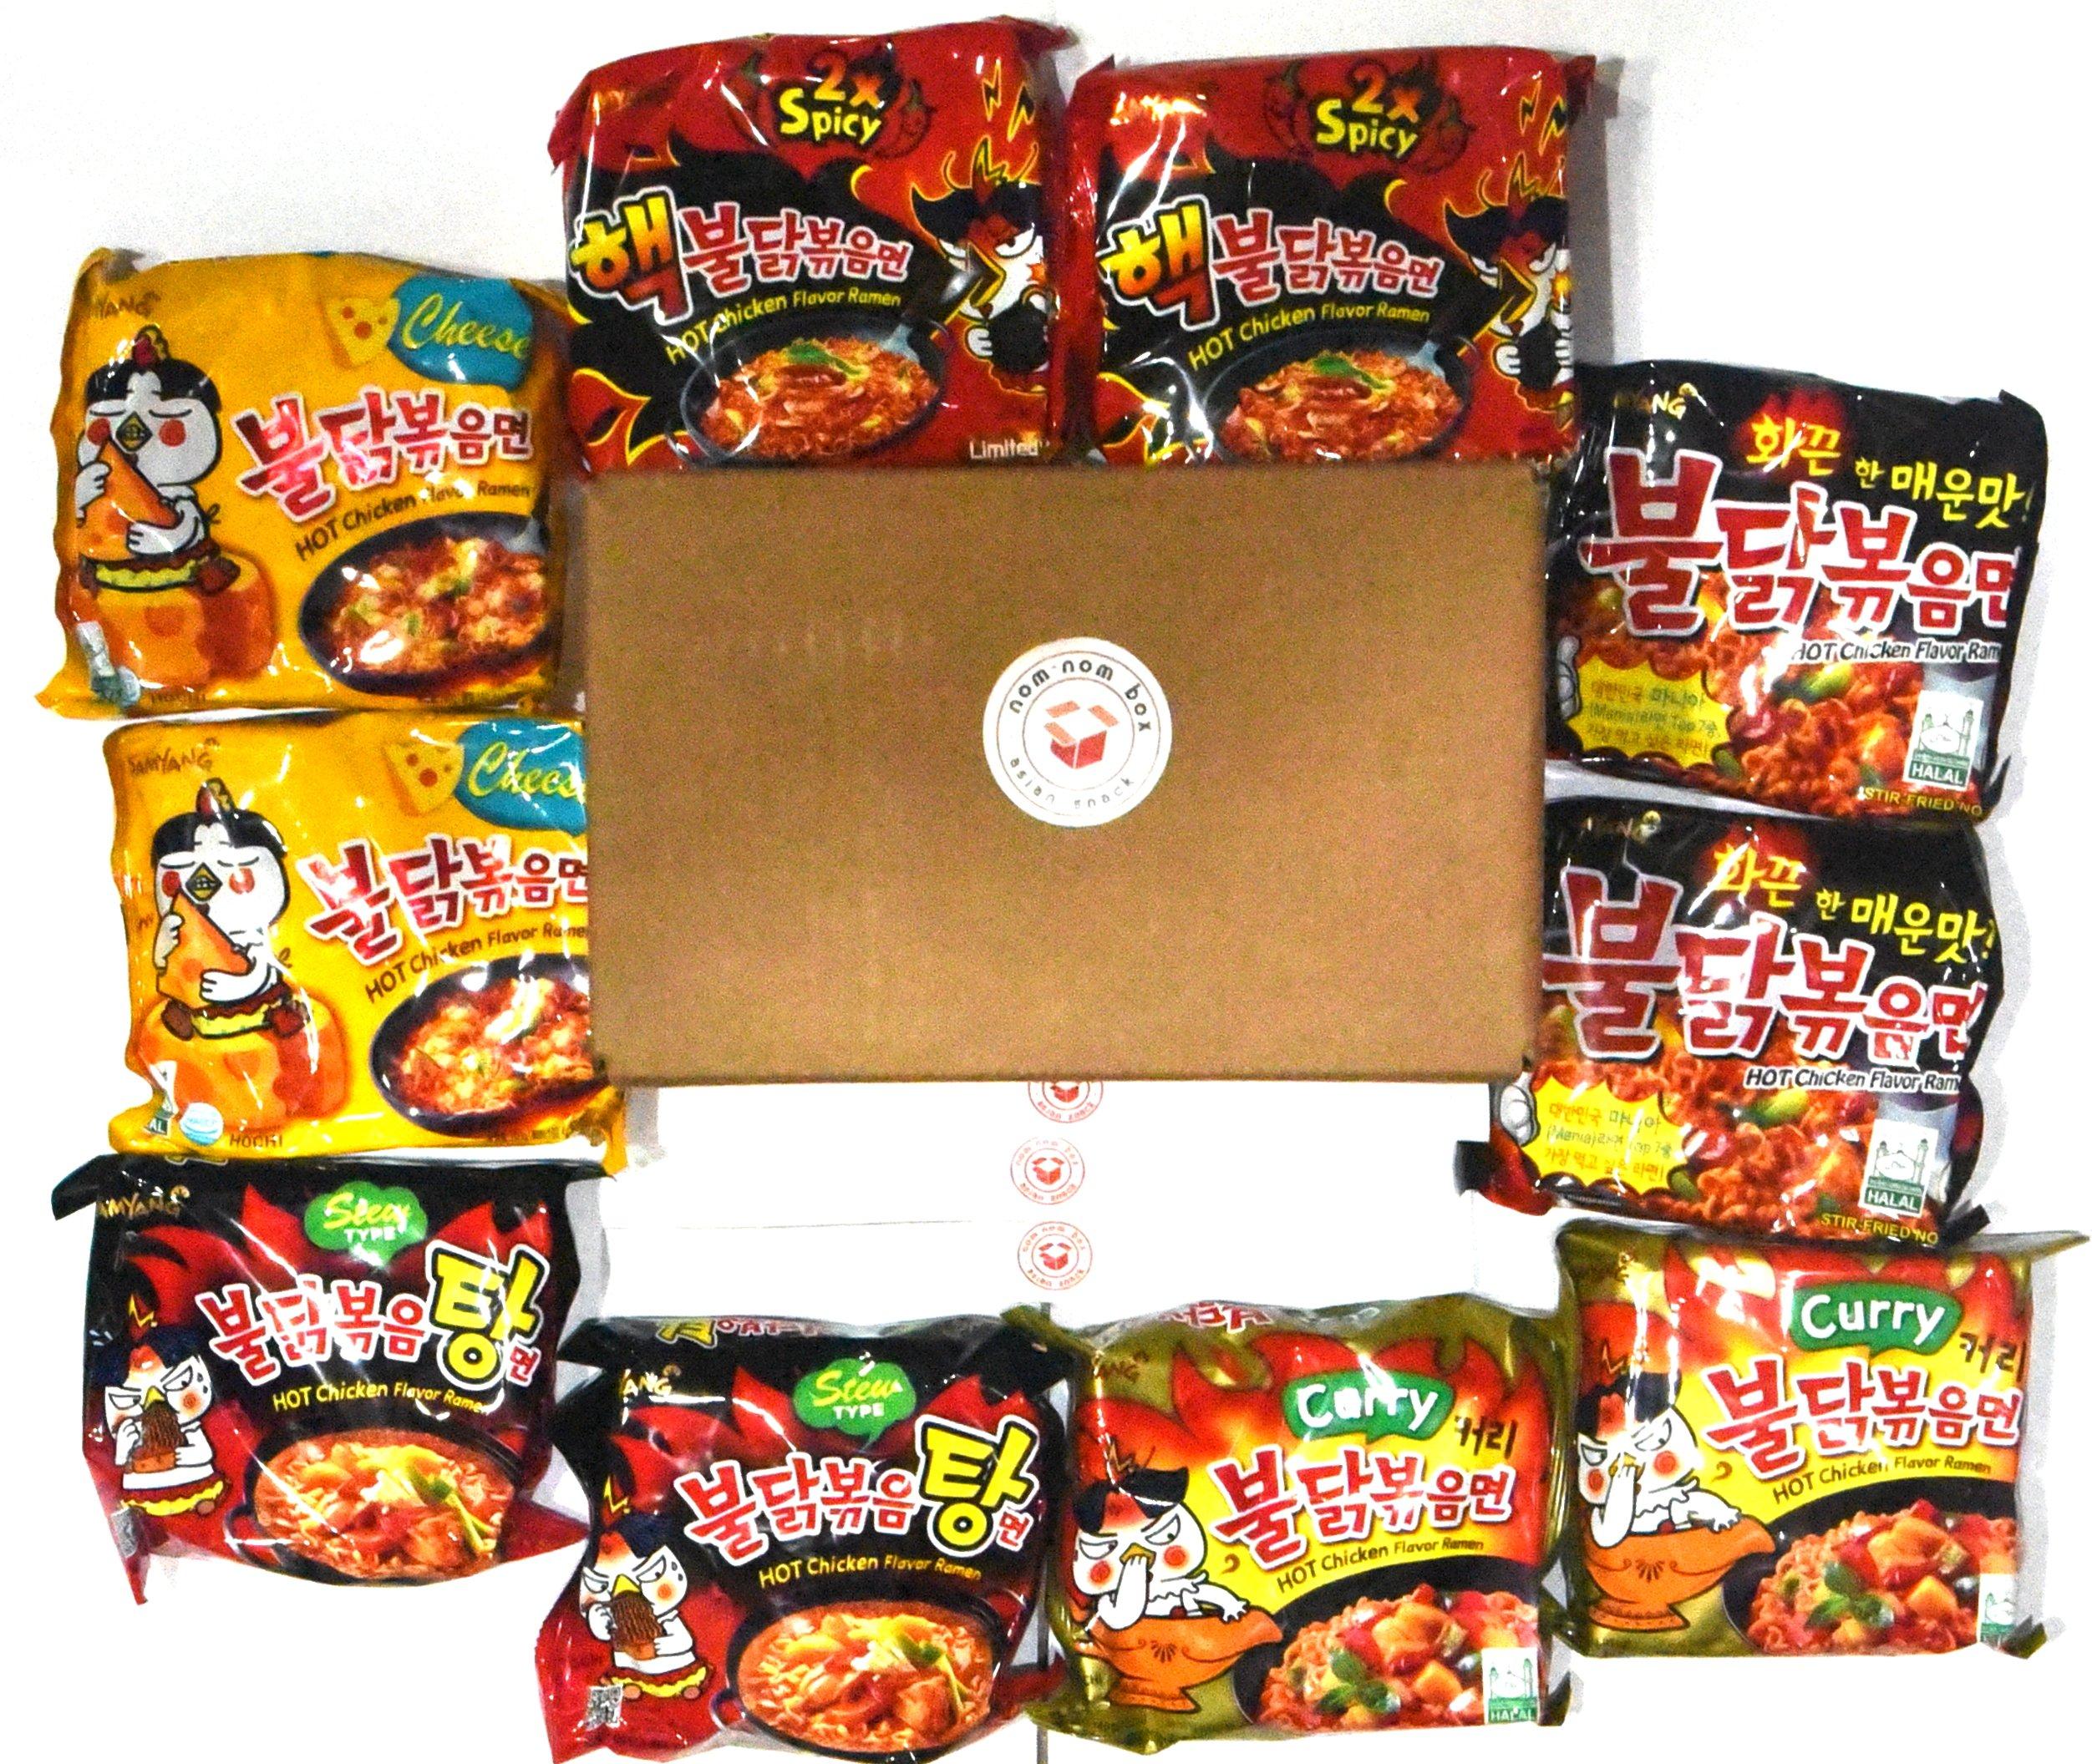 Samyang Ramen Spicy Hot Chicken Roasted Noodles Variety (10-Pack) | Hek Nuclear, Original, Cheese, Curry, Stew | & Nom Nom Box Chopsticks (10 Count)